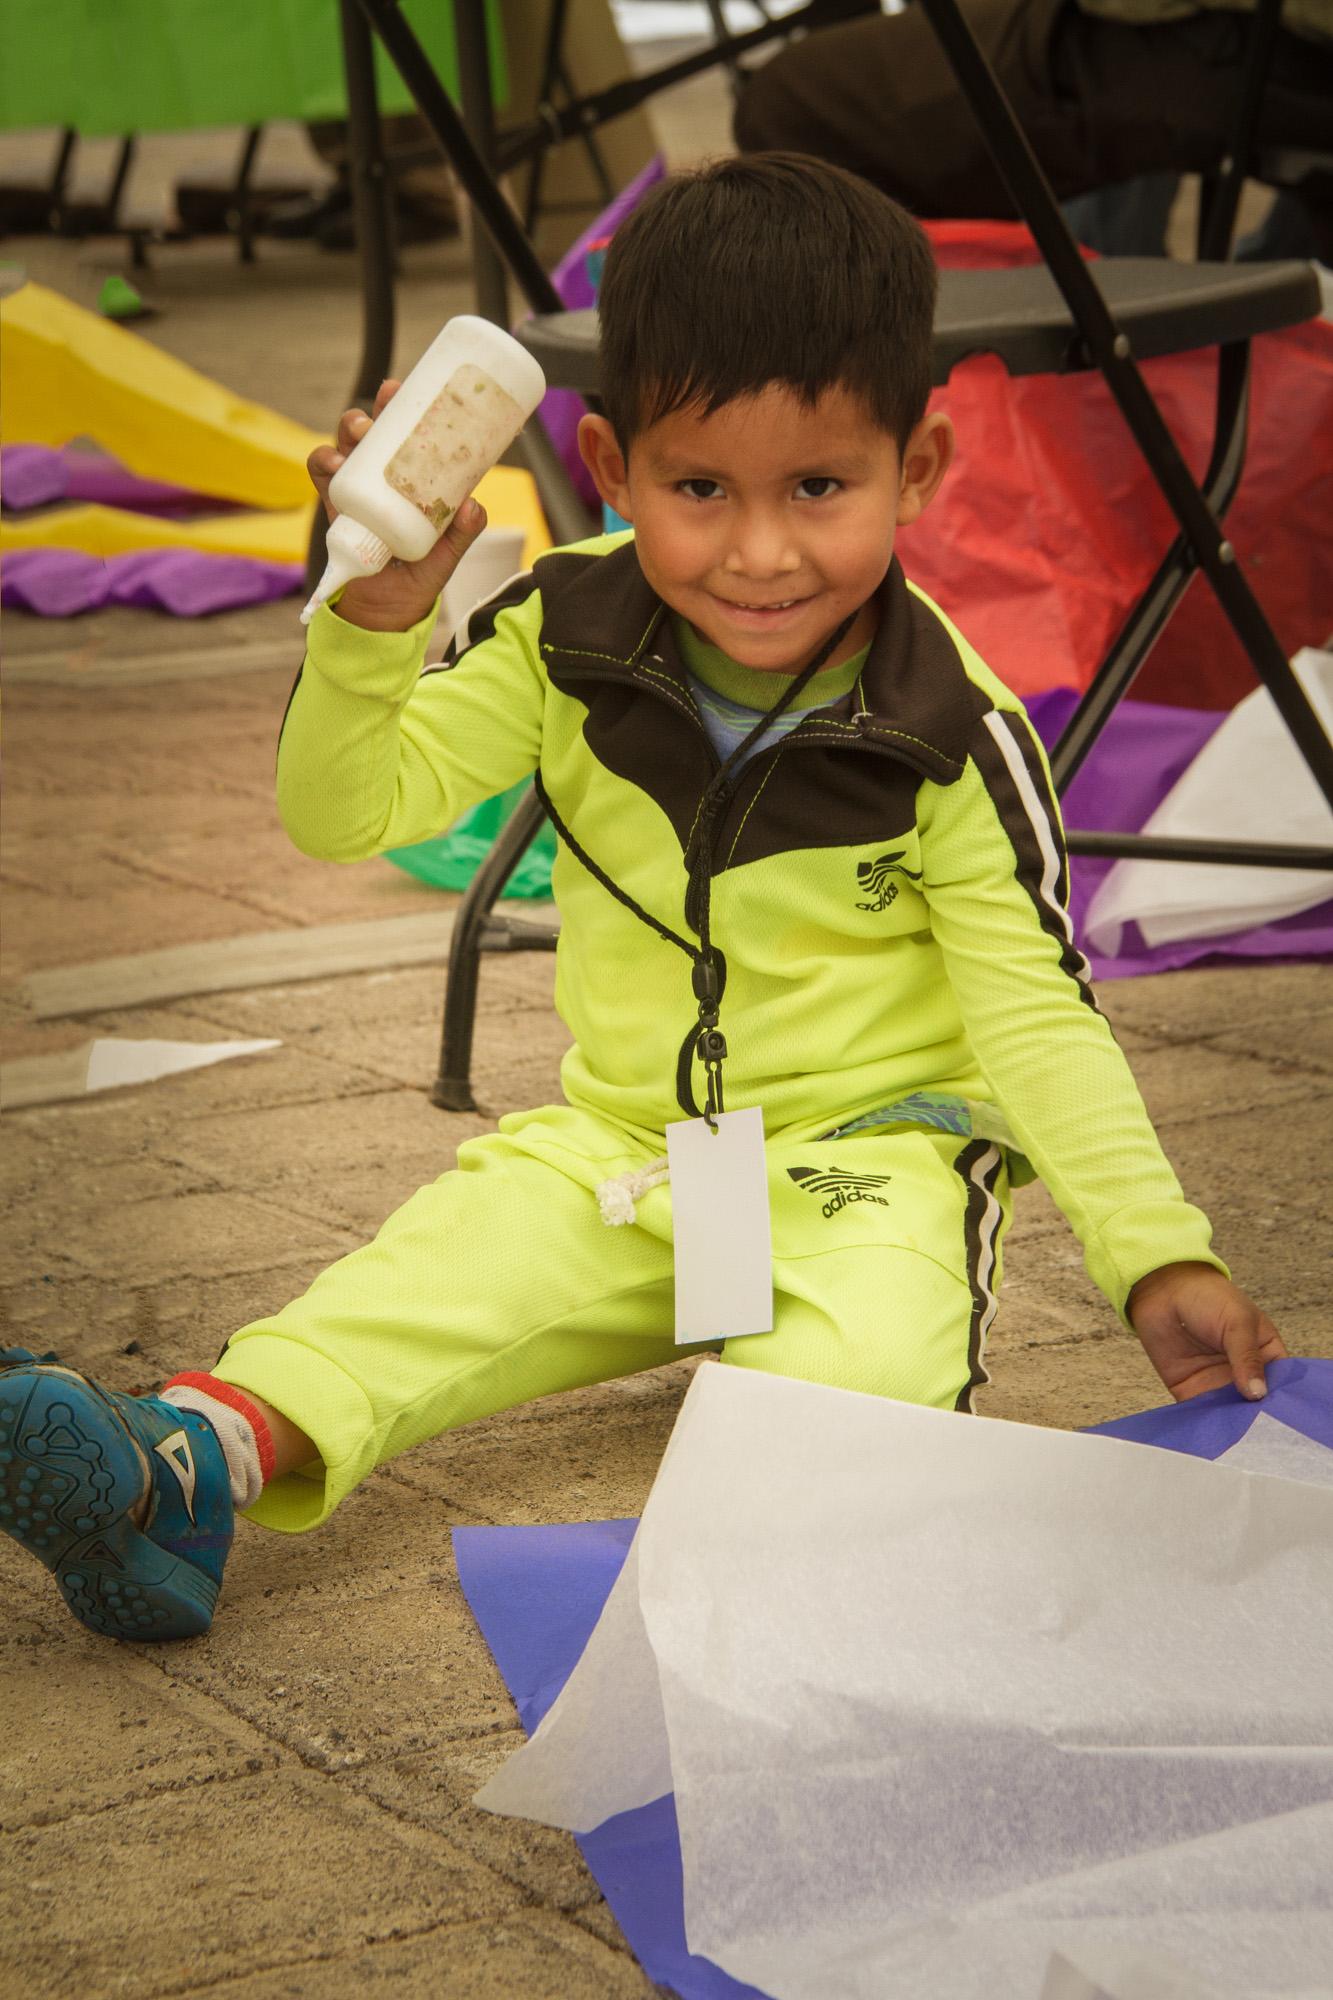 """Look! I'm Helping!""(aka Whirling Dervish)   CantoyaFest: Pátzcuaro, Michoacán, Mexico — Friday, July 21, 2017"